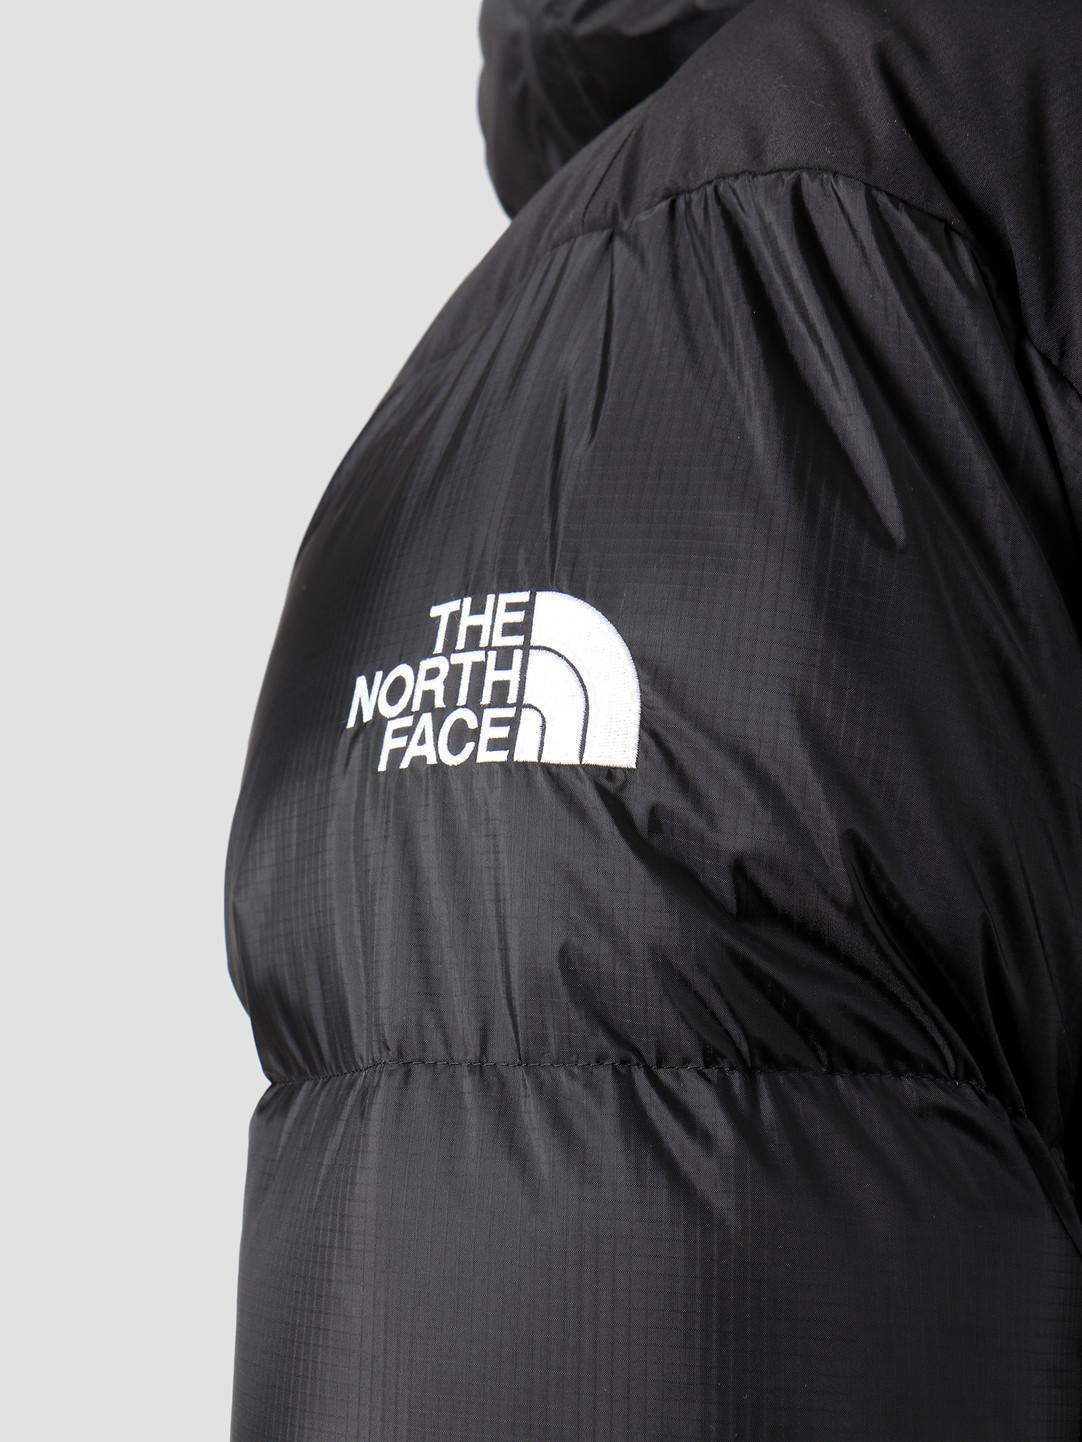 The North Face The North Face 7Se 95 Retro Denali Jacket Tnf Black Nf0A3Xenjk31